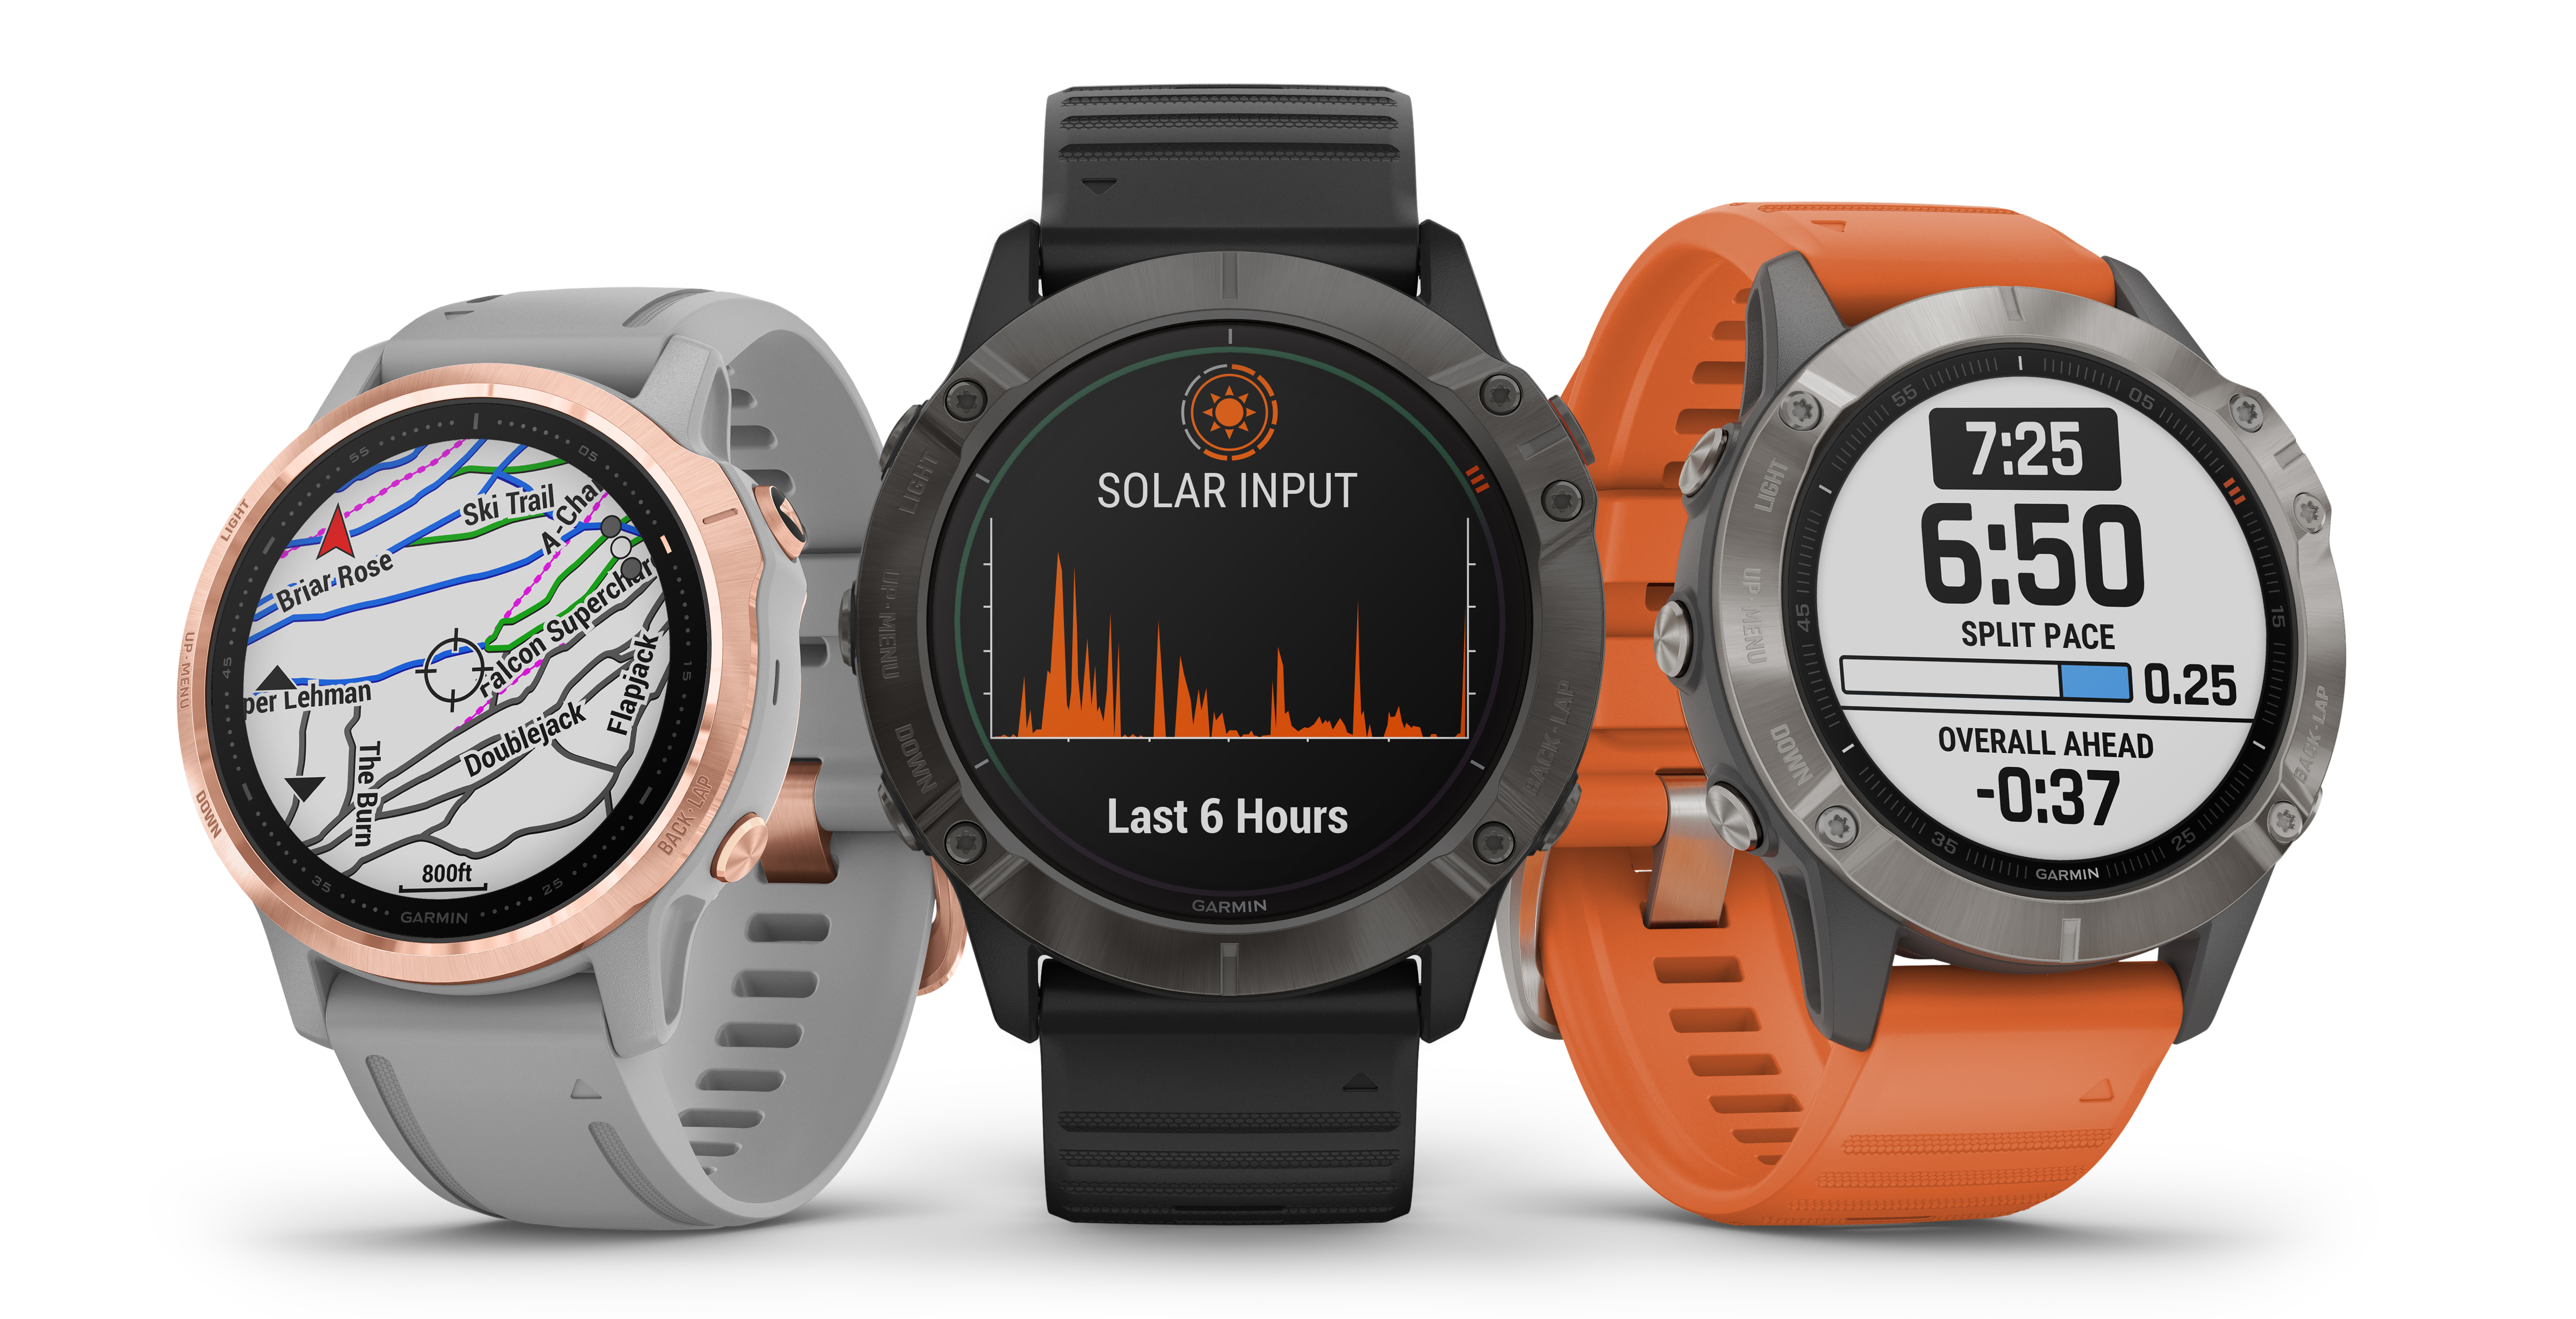 Garmin Fenix 6X Pro Solar goes official as the first Solar-powered smartwatch